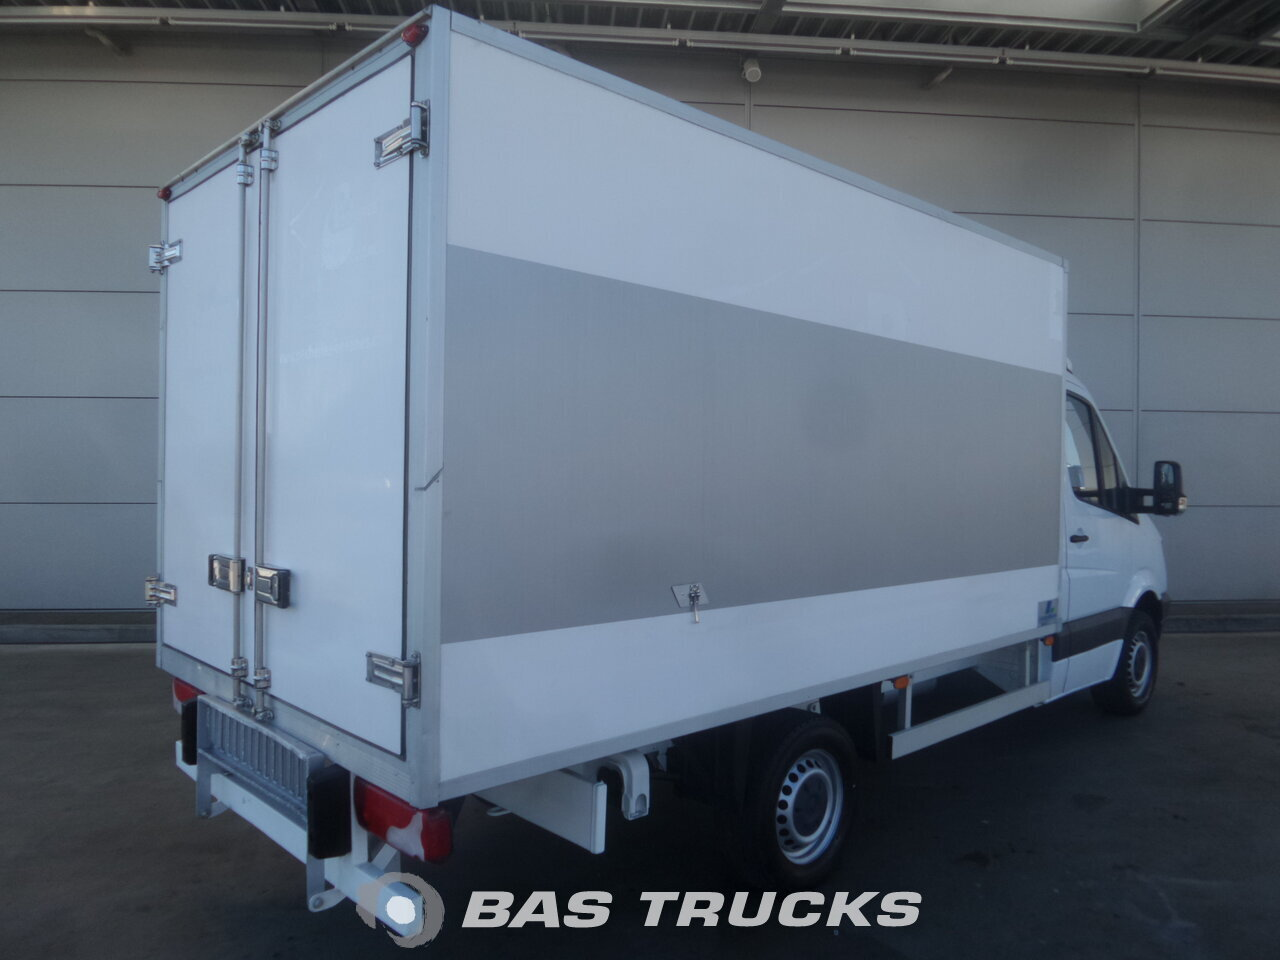 mercedes sprinter furgoneta liviana 13900 bas trucks. Black Bedroom Furniture Sets. Home Design Ideas